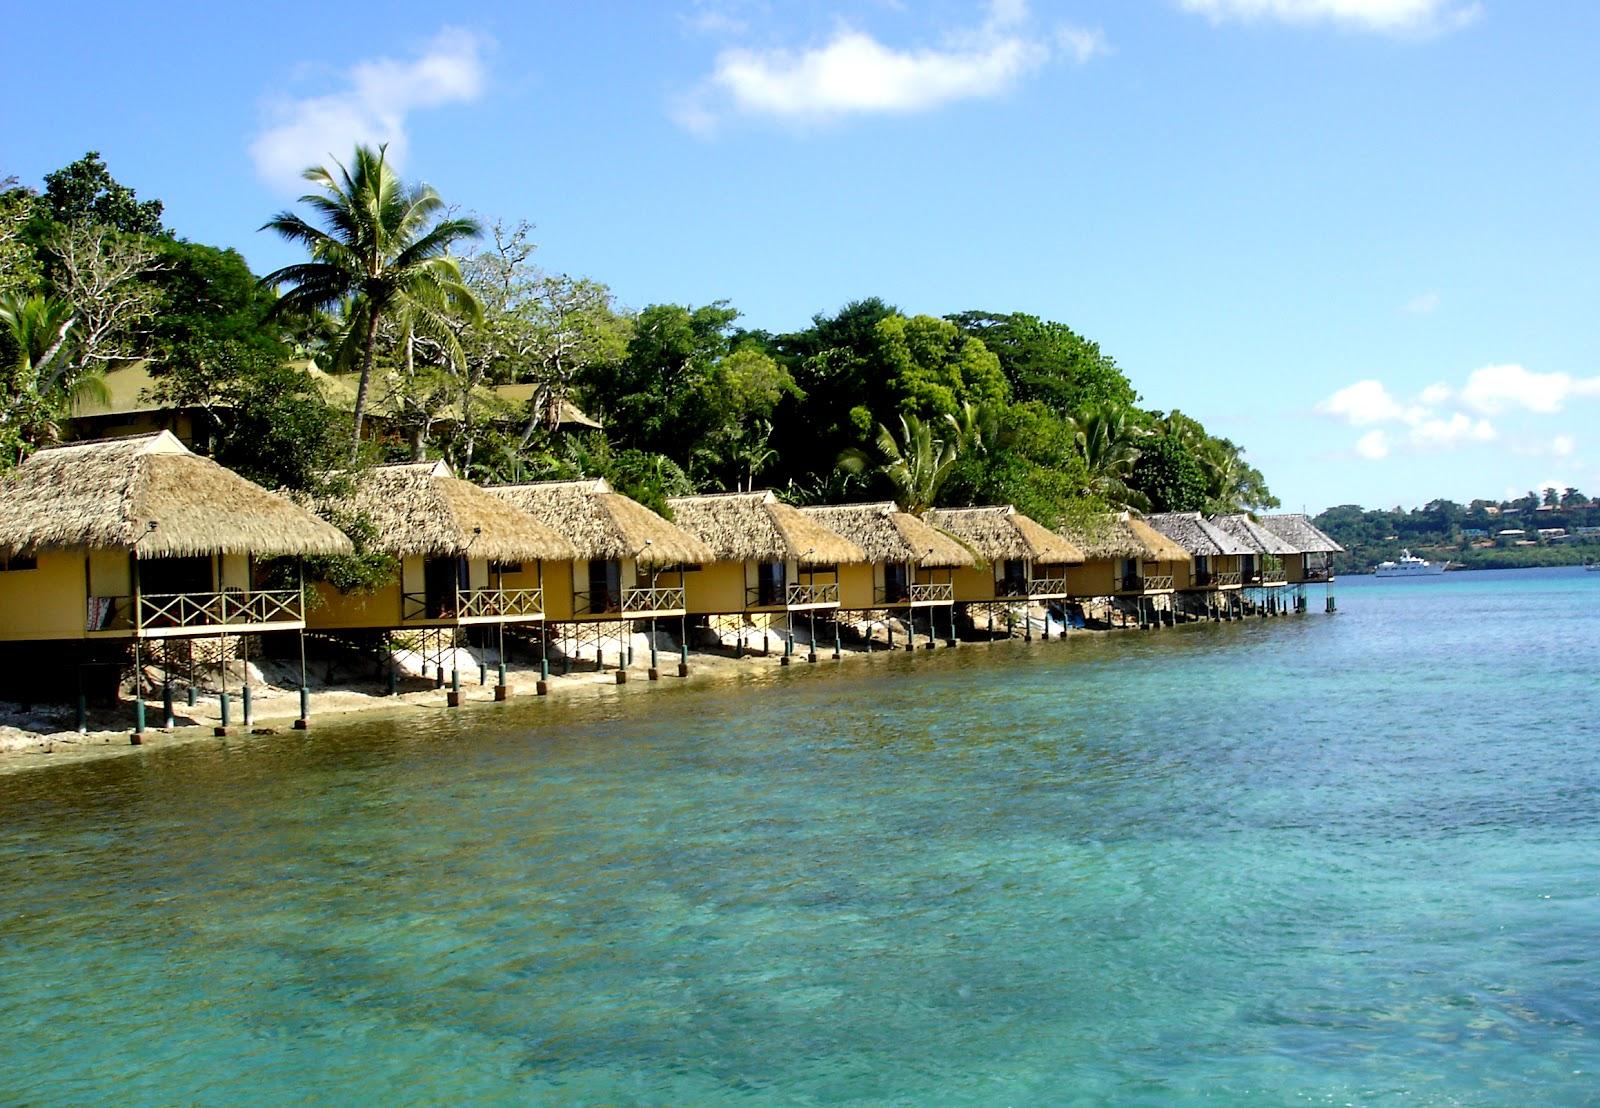 Vanuatu and its Incredible Islands - Tourist Destinations